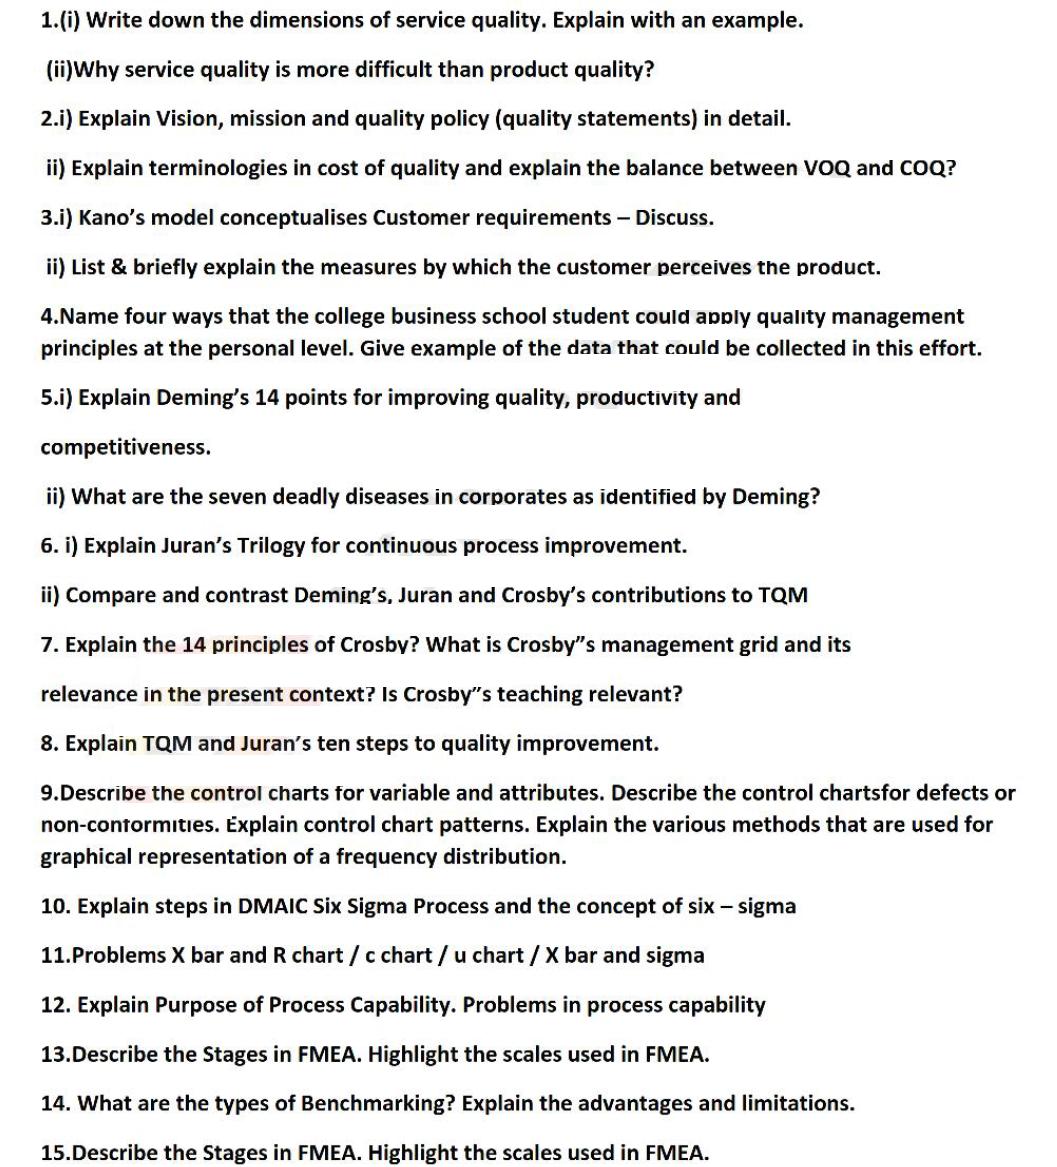 002 Against Death Penalty Essays Essay The Argumen Reasons Argument Arguments Shocking Body Conclusion Anti Full